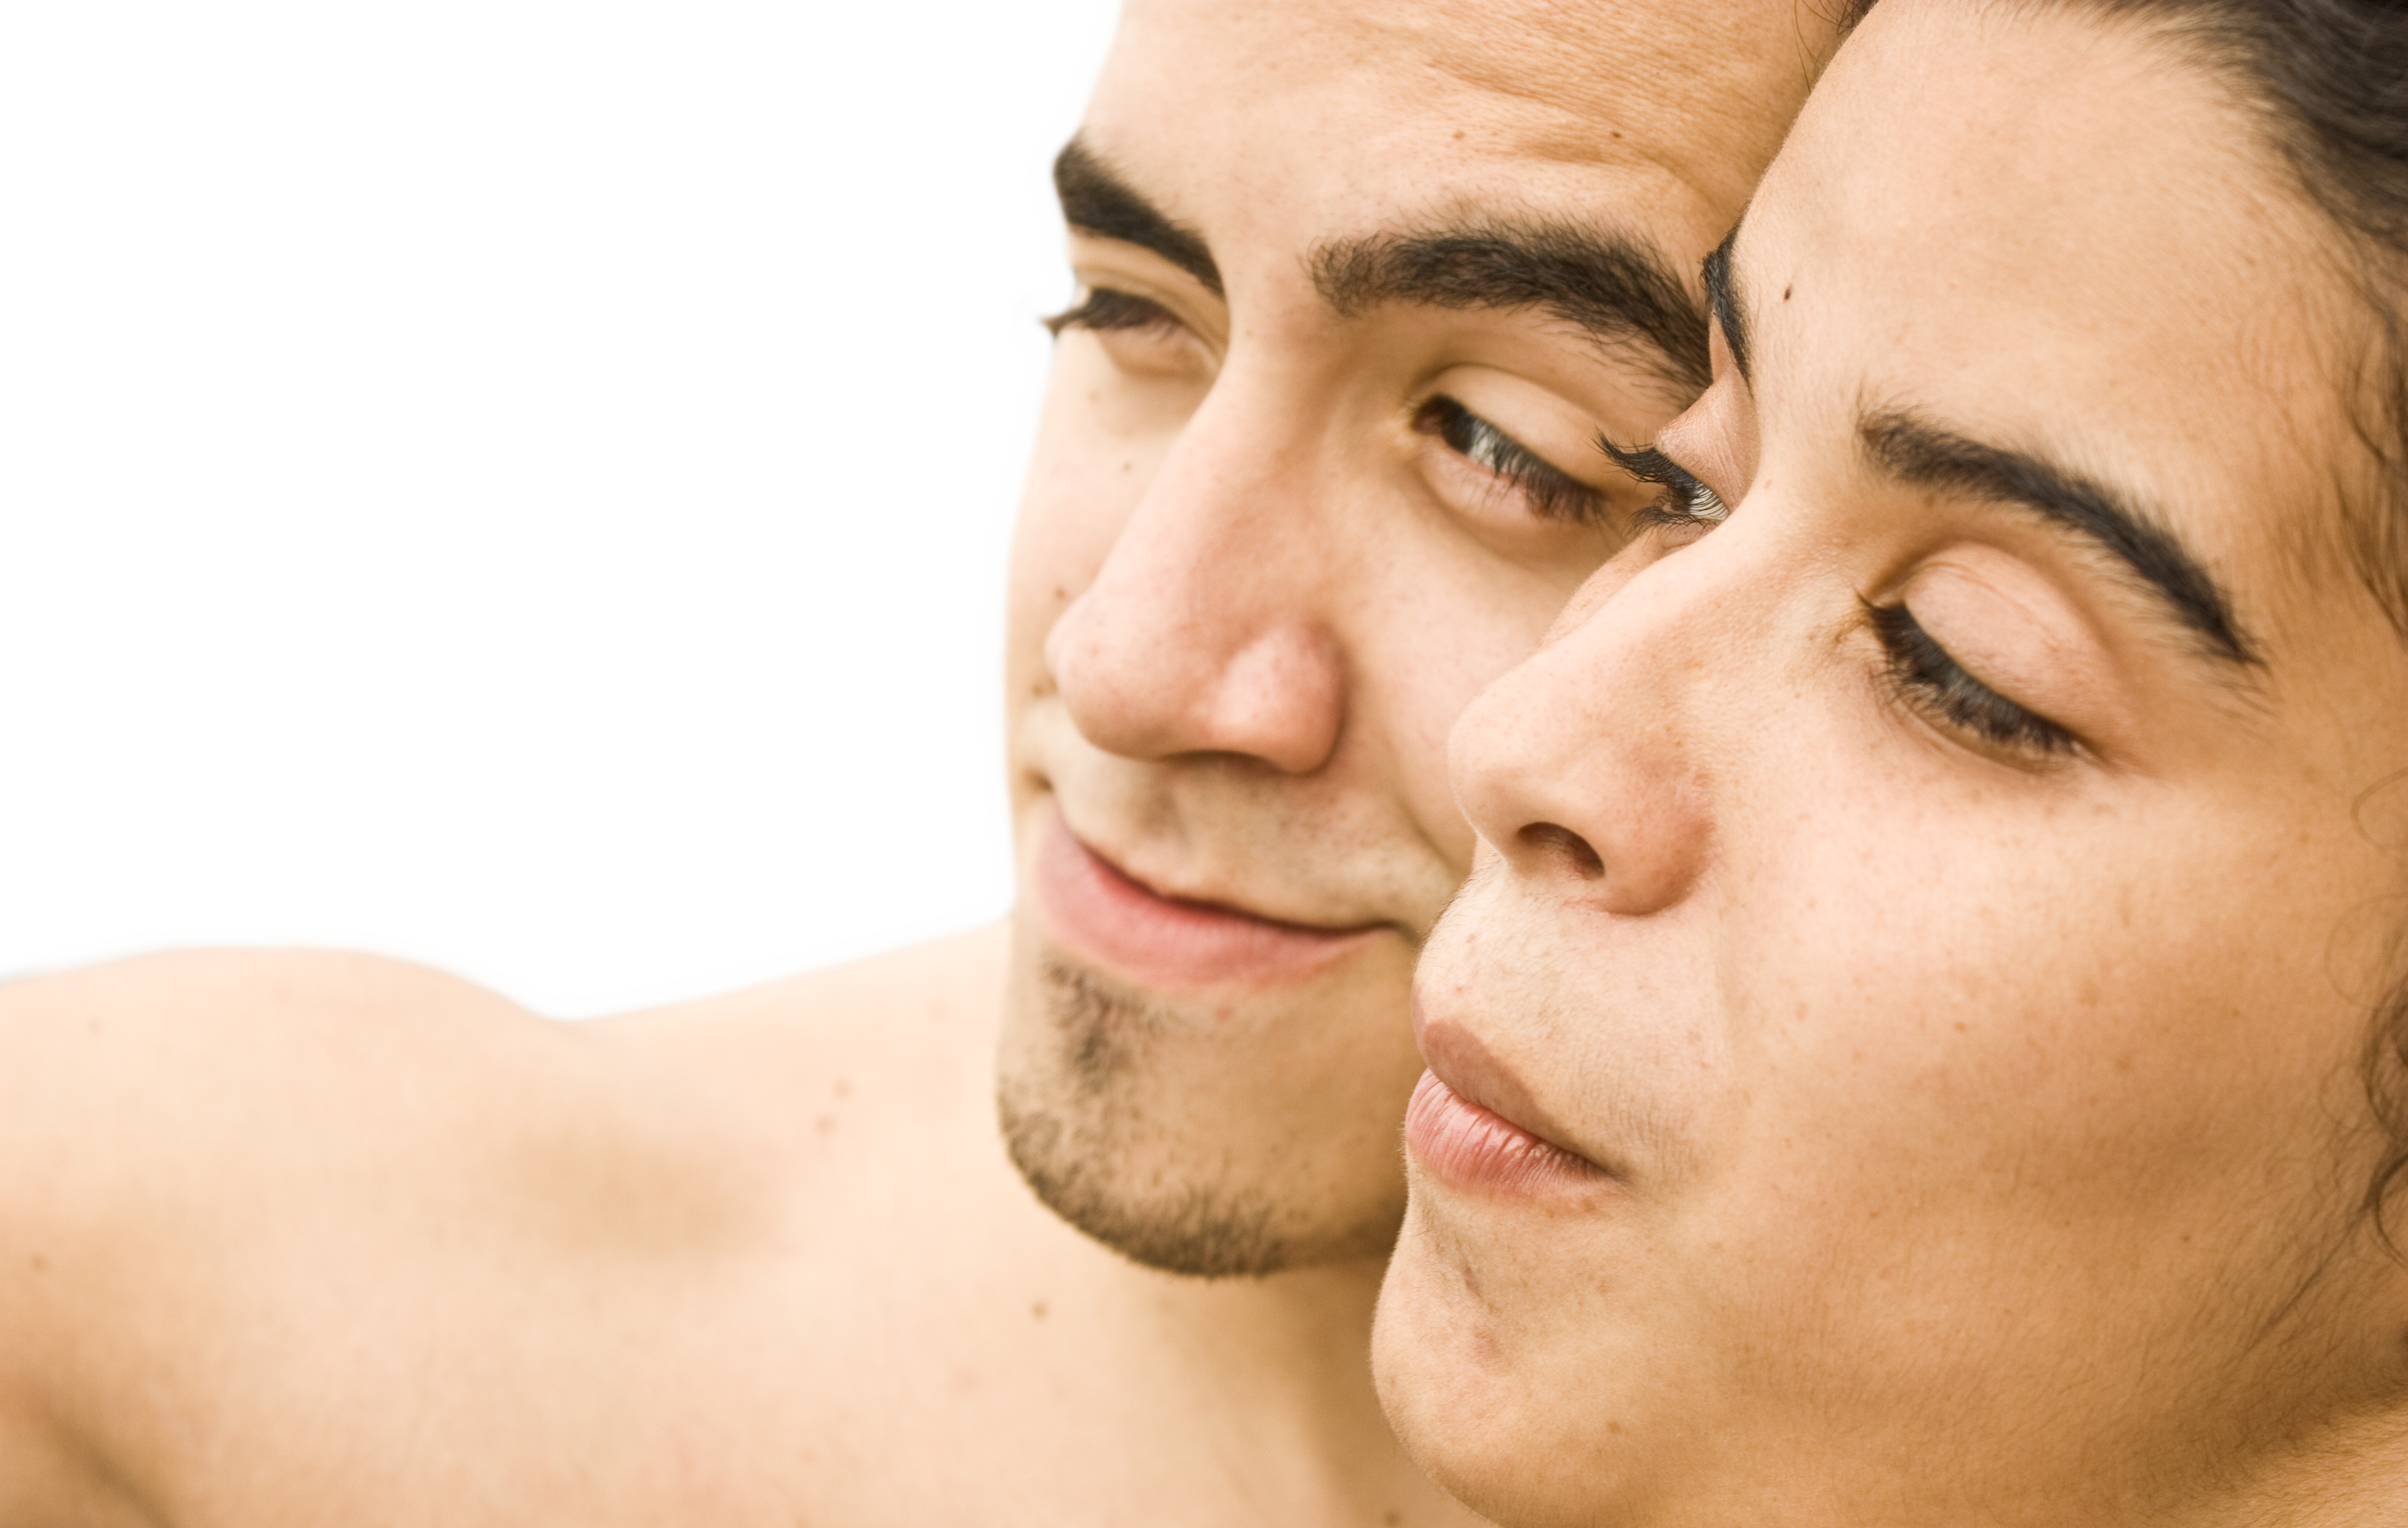 Erectie Slaba: Cauzele erectiei slabe – cum pot cauza disfunctii erectile factorii psihologici